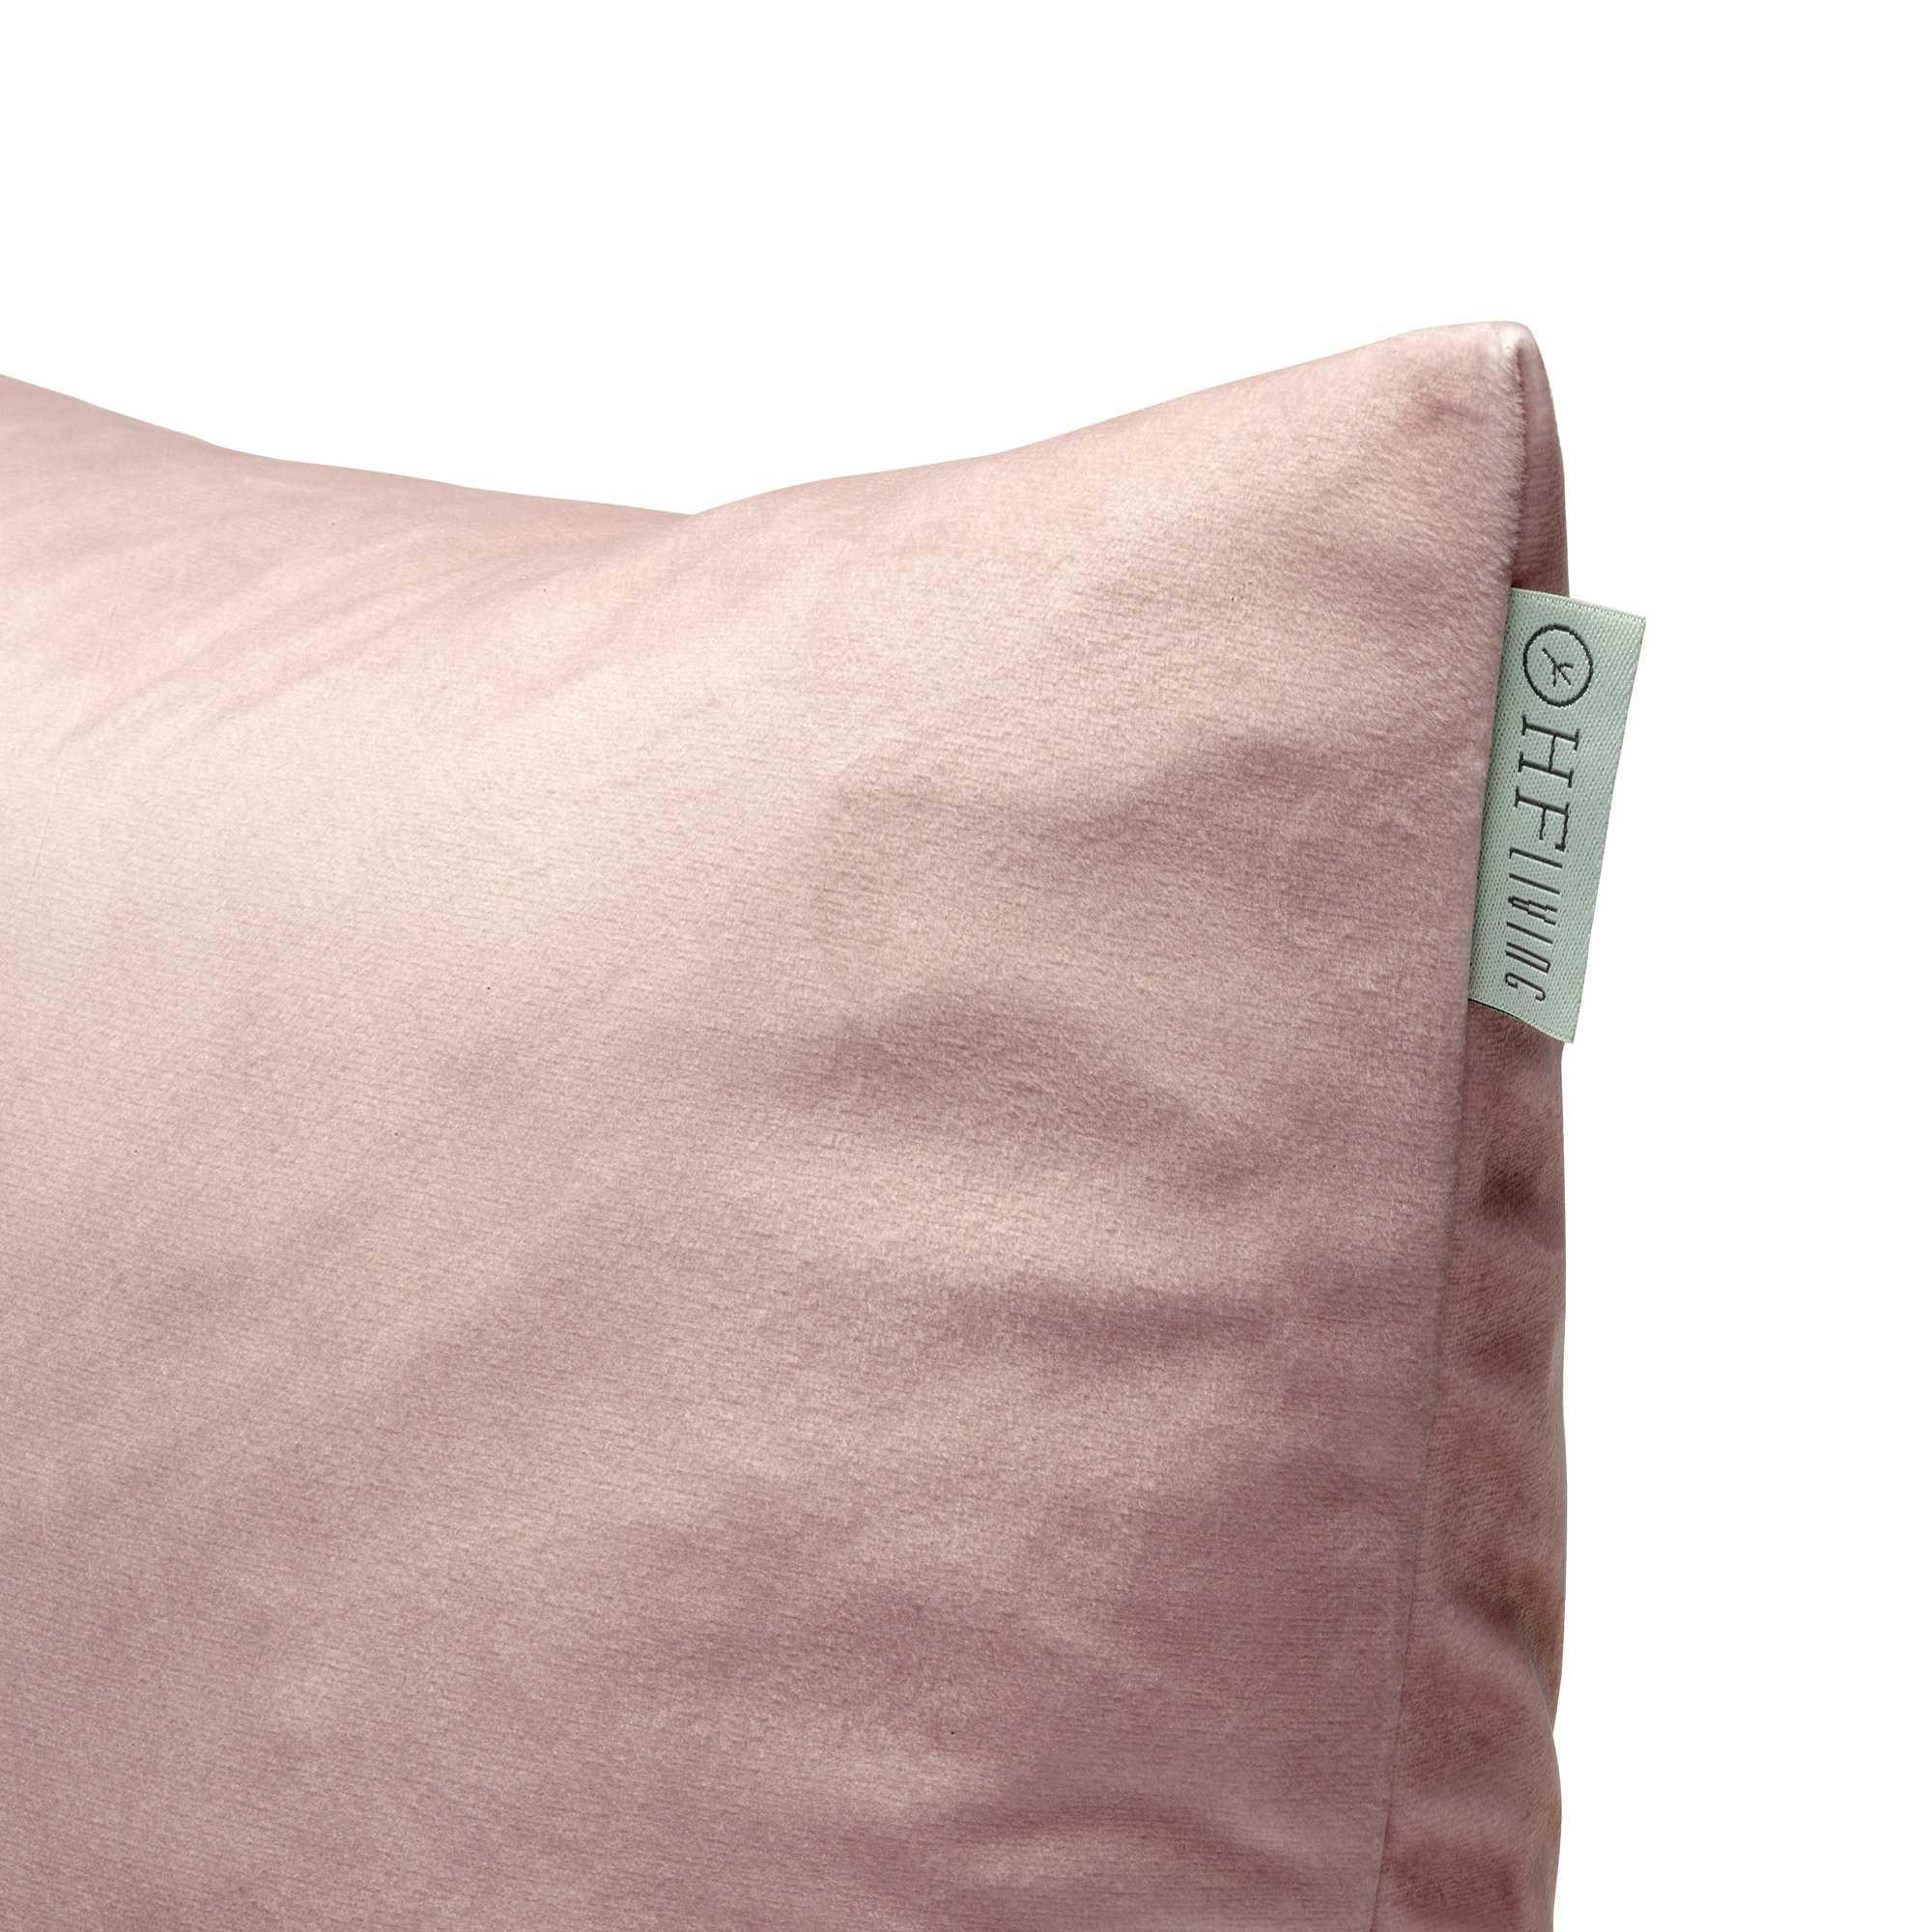 Kussensloop Fluweel Roze | 100% Polyester